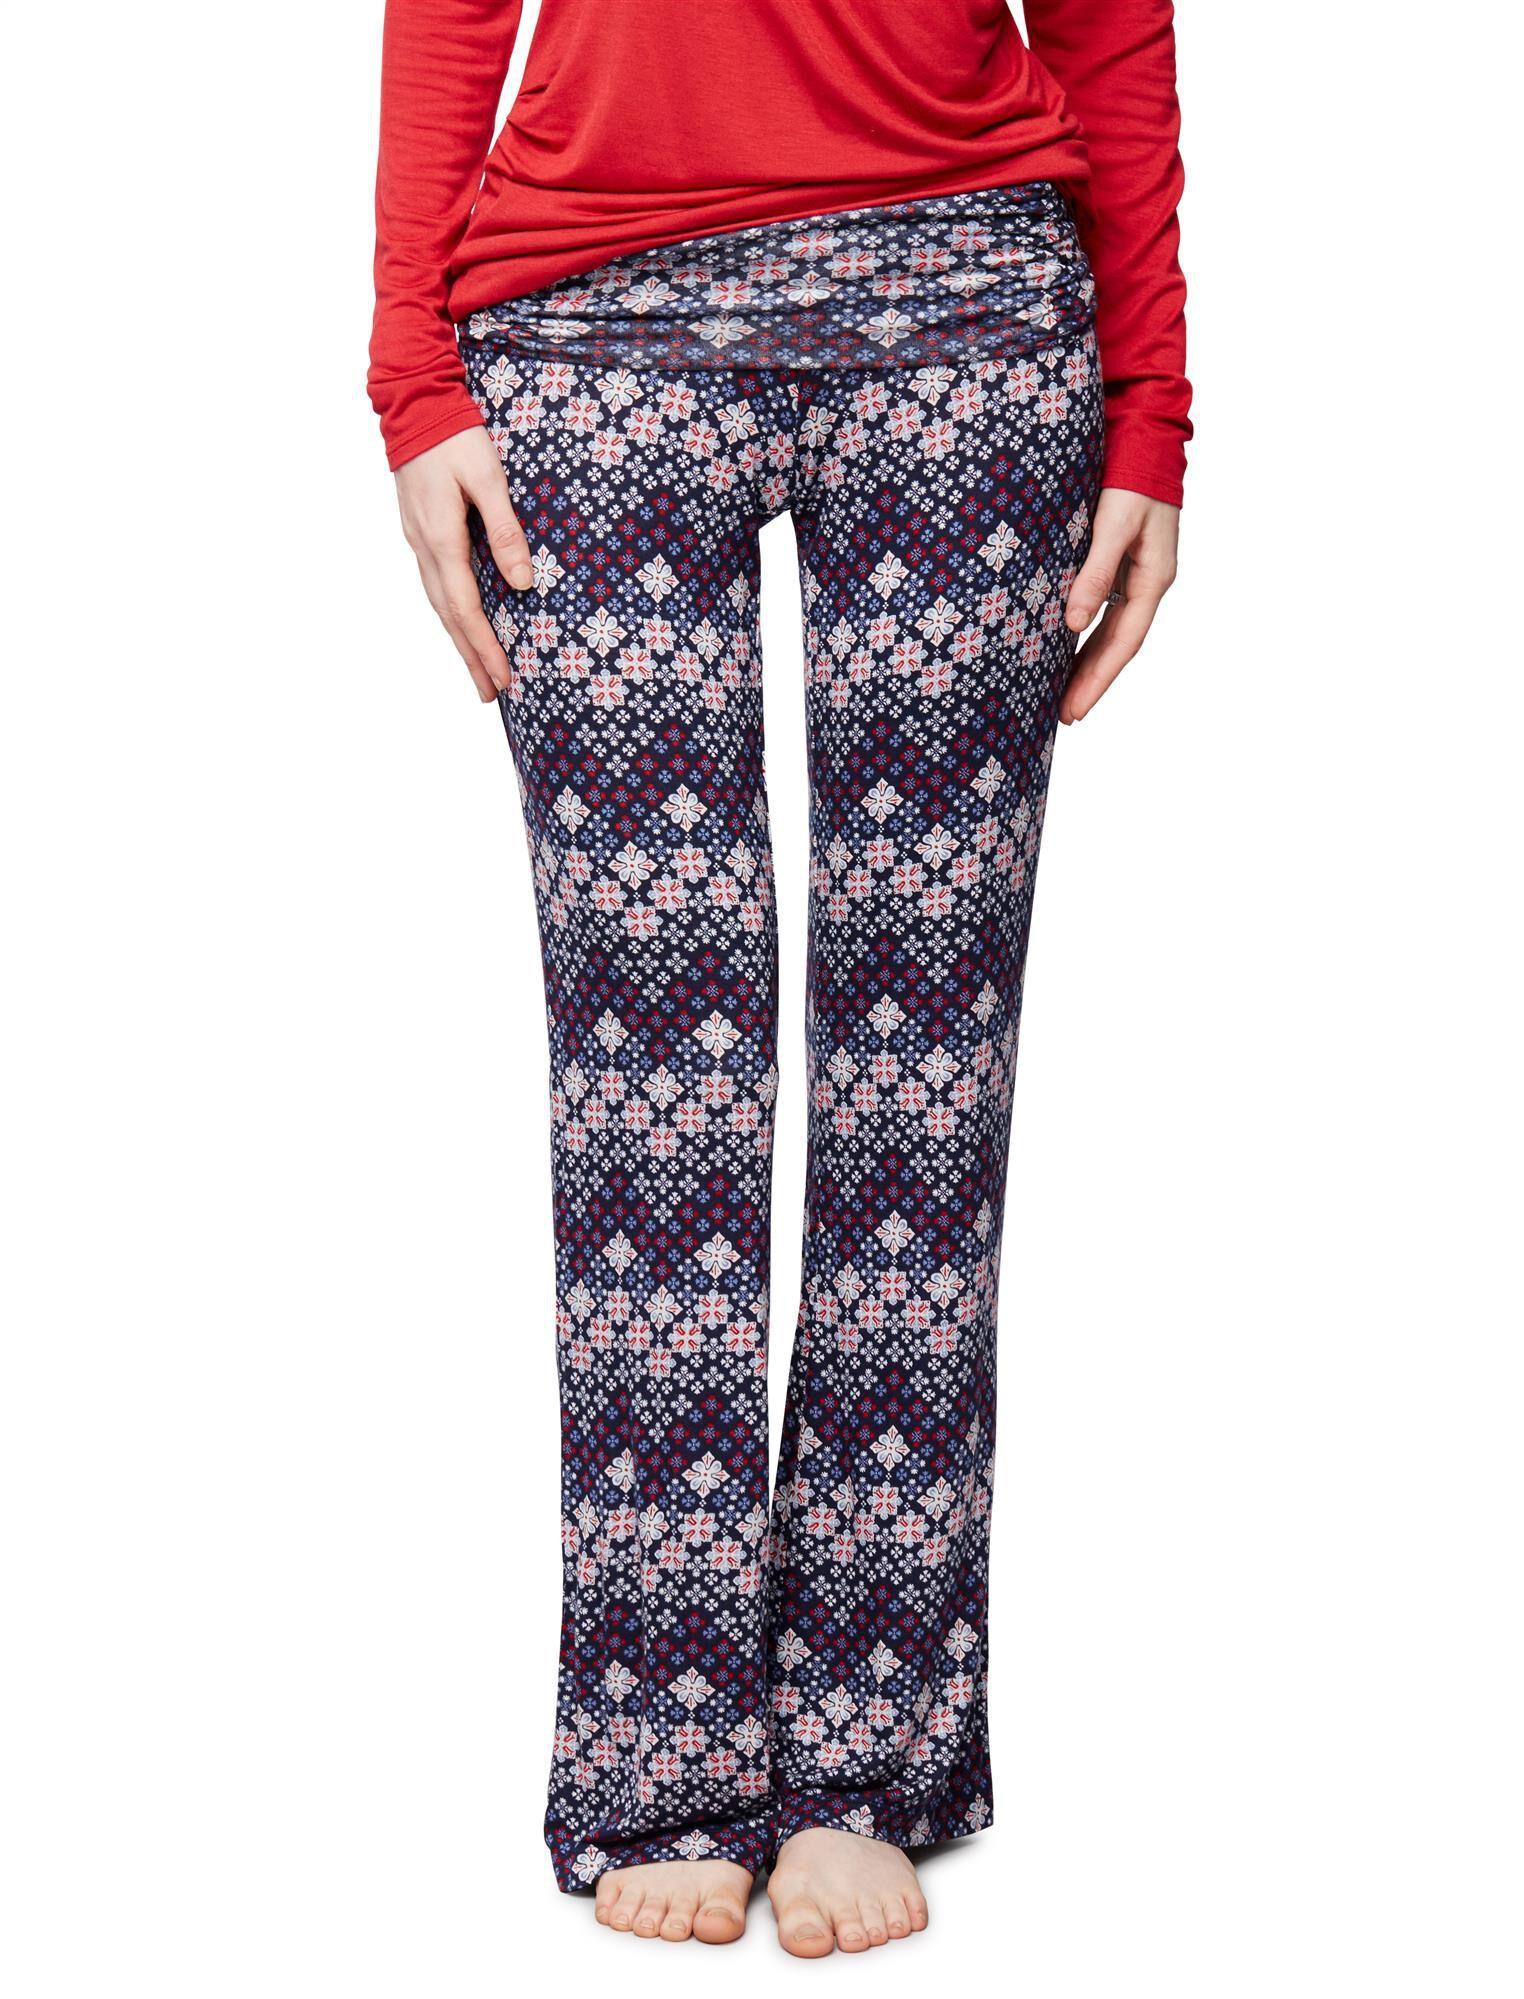 Bow Detail Maternity Sleep Pants- Prints